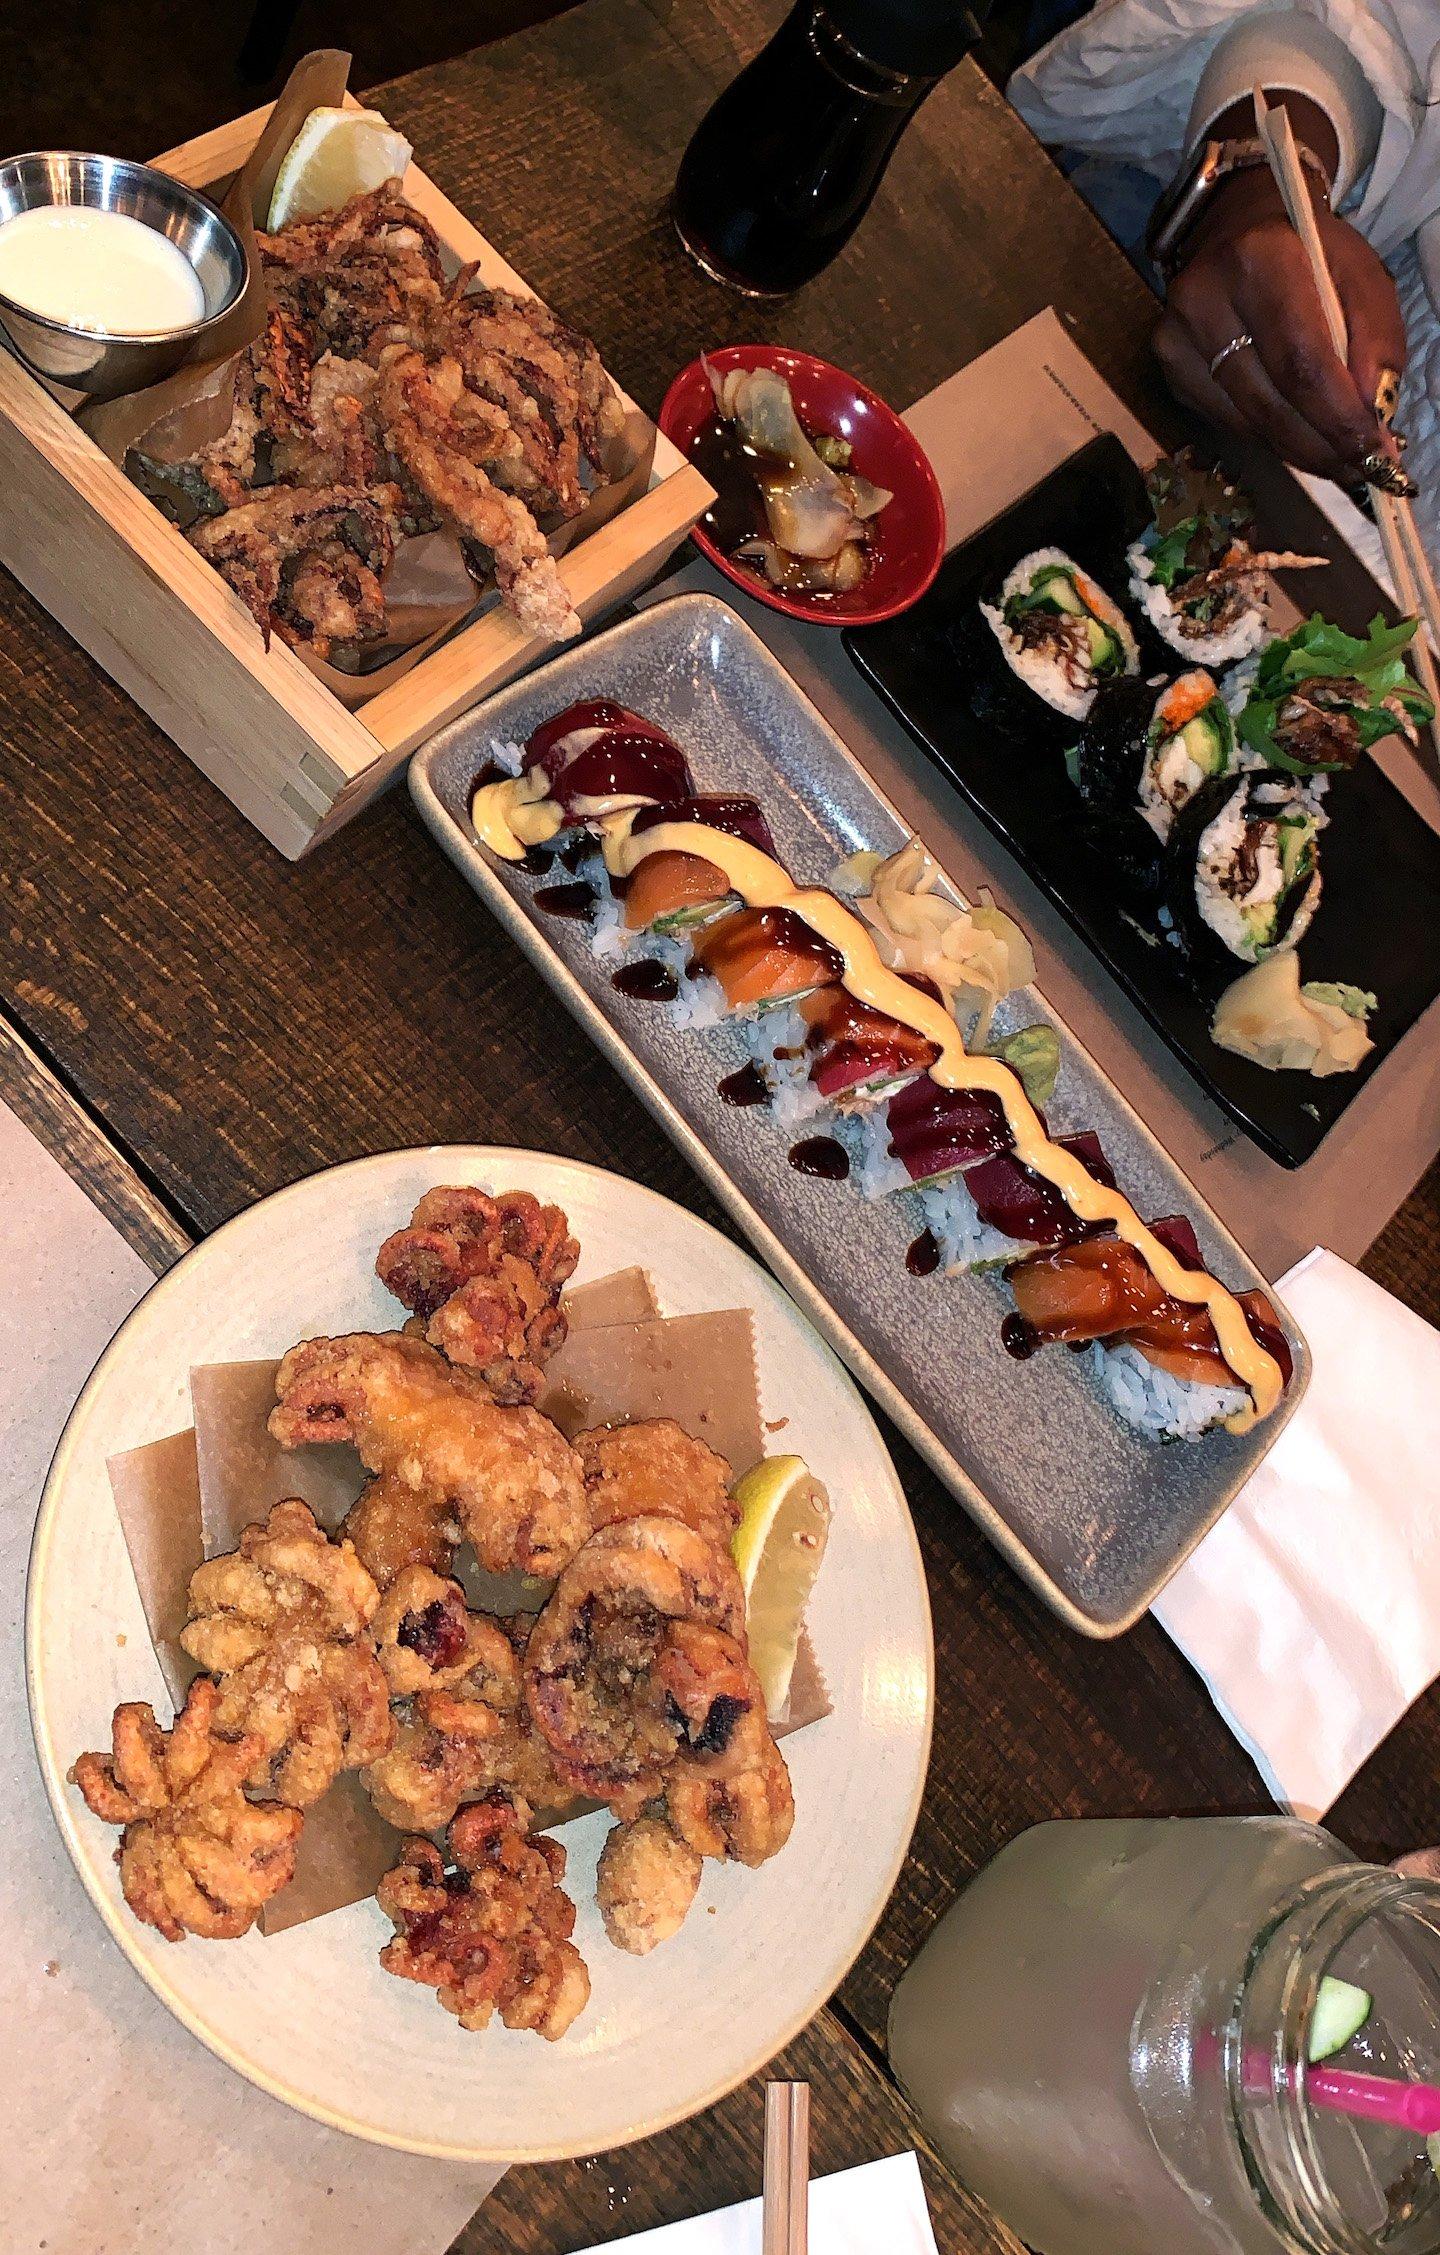 Dinner at Izakaya Mew